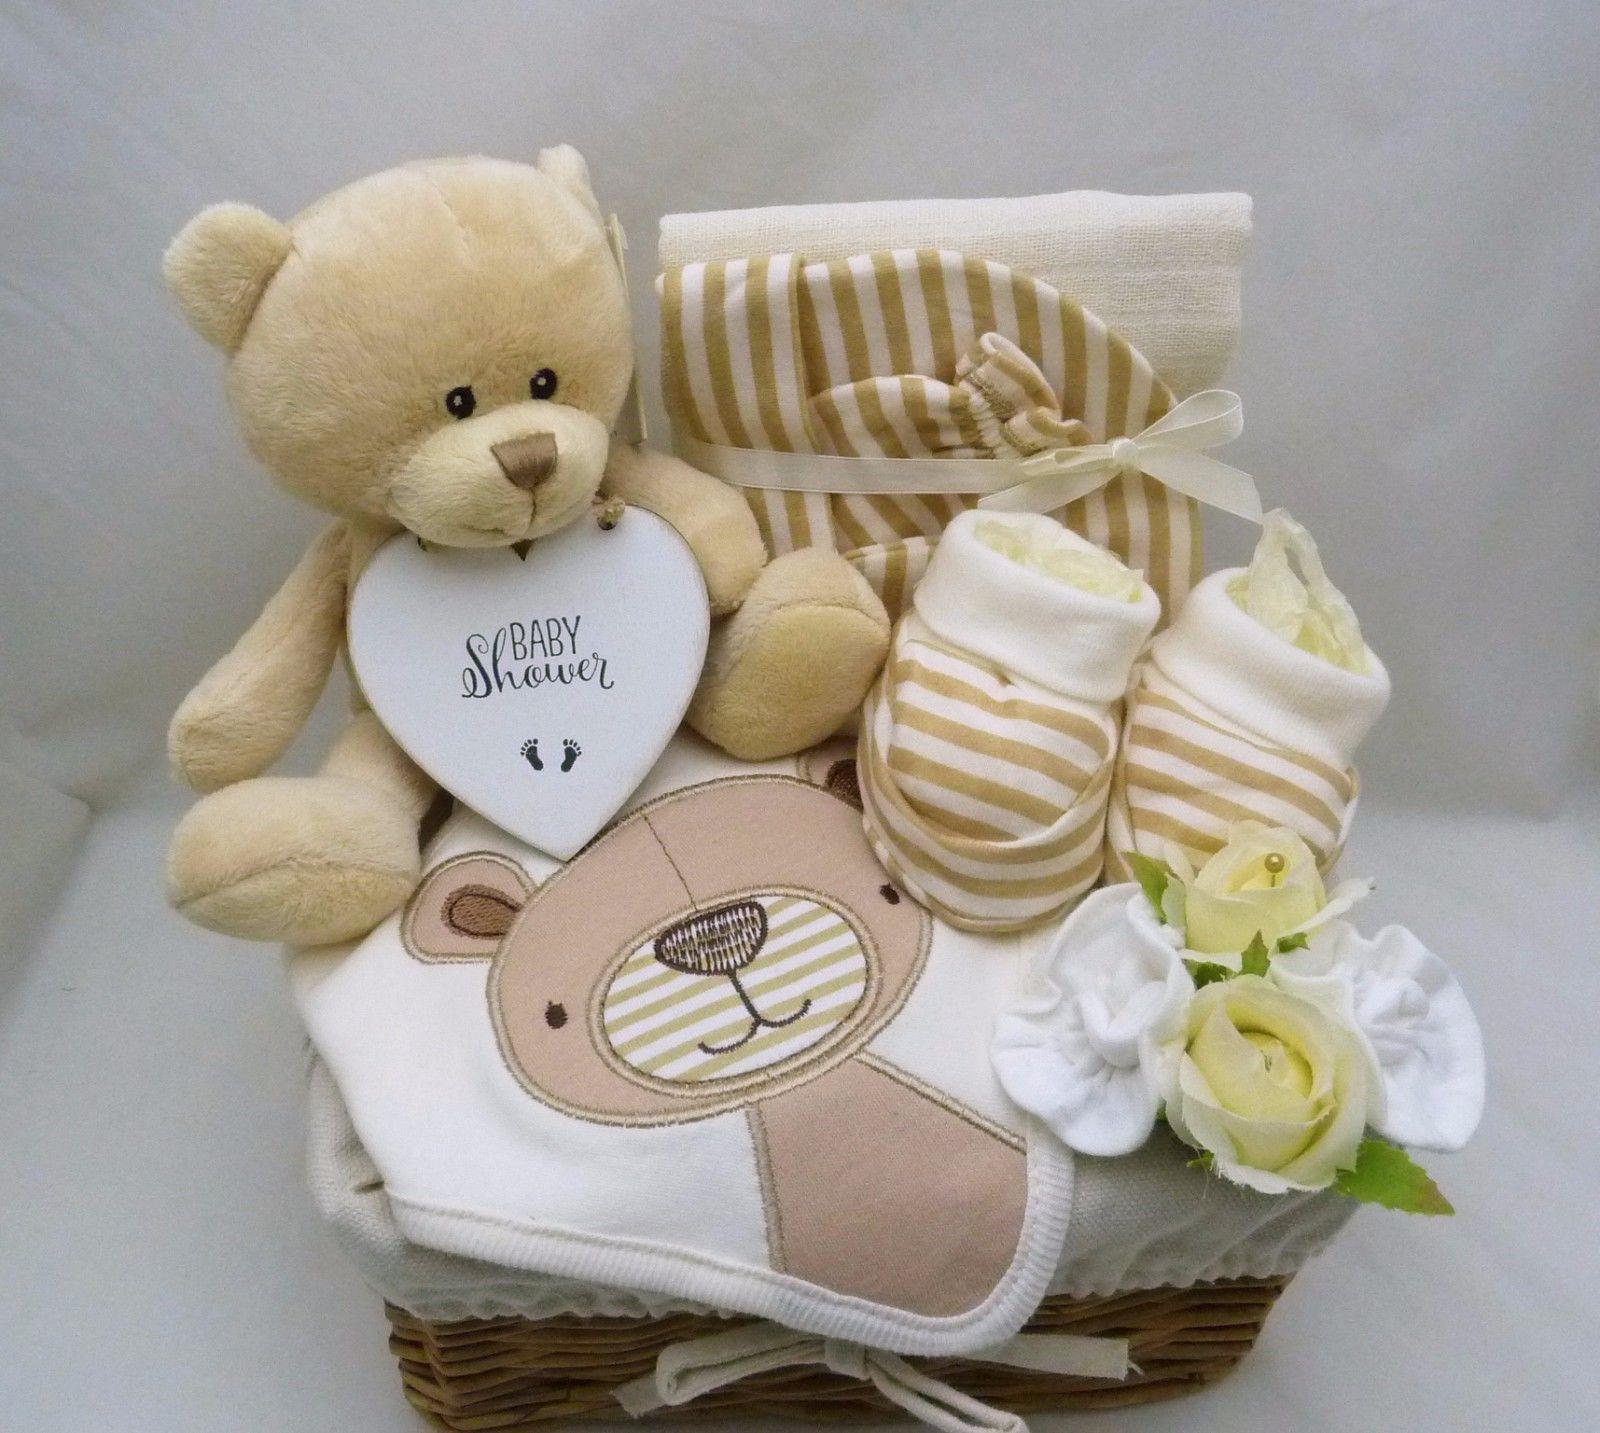 Pregnancy Gift Baskets Shop Pregnancy Gift Baskets Online